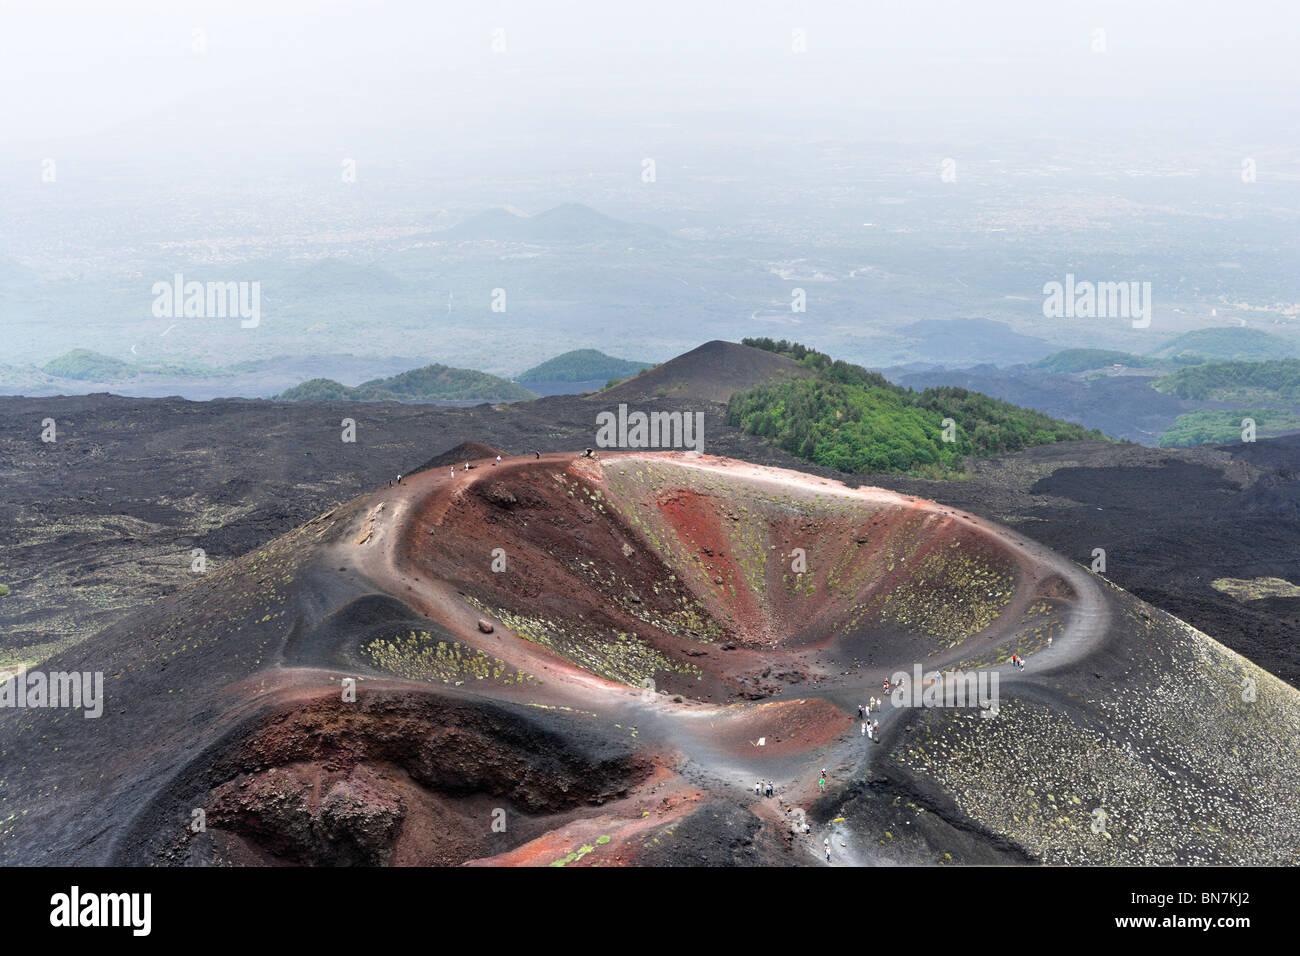 A crater near the Rifugio Sapienza on the southern slopes looking towards the coast, Mount Etna, Sicily, Italy - Stock Image